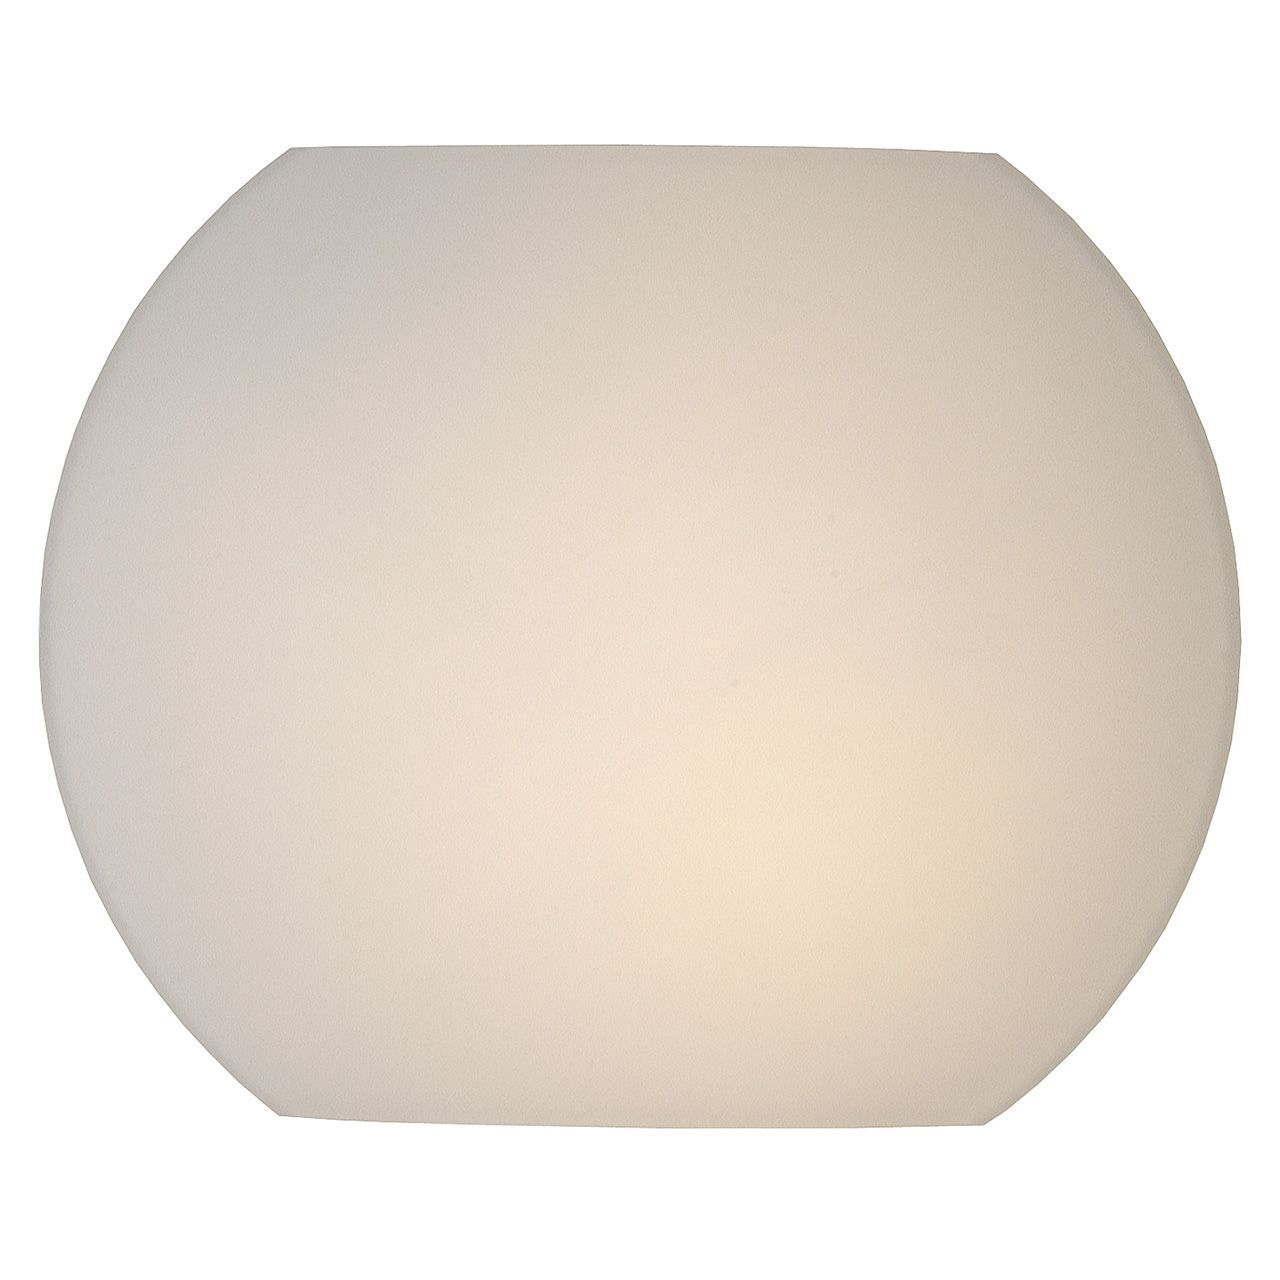 Настенный светильник Lucide Lagan 20226/25/61 цены онлайн